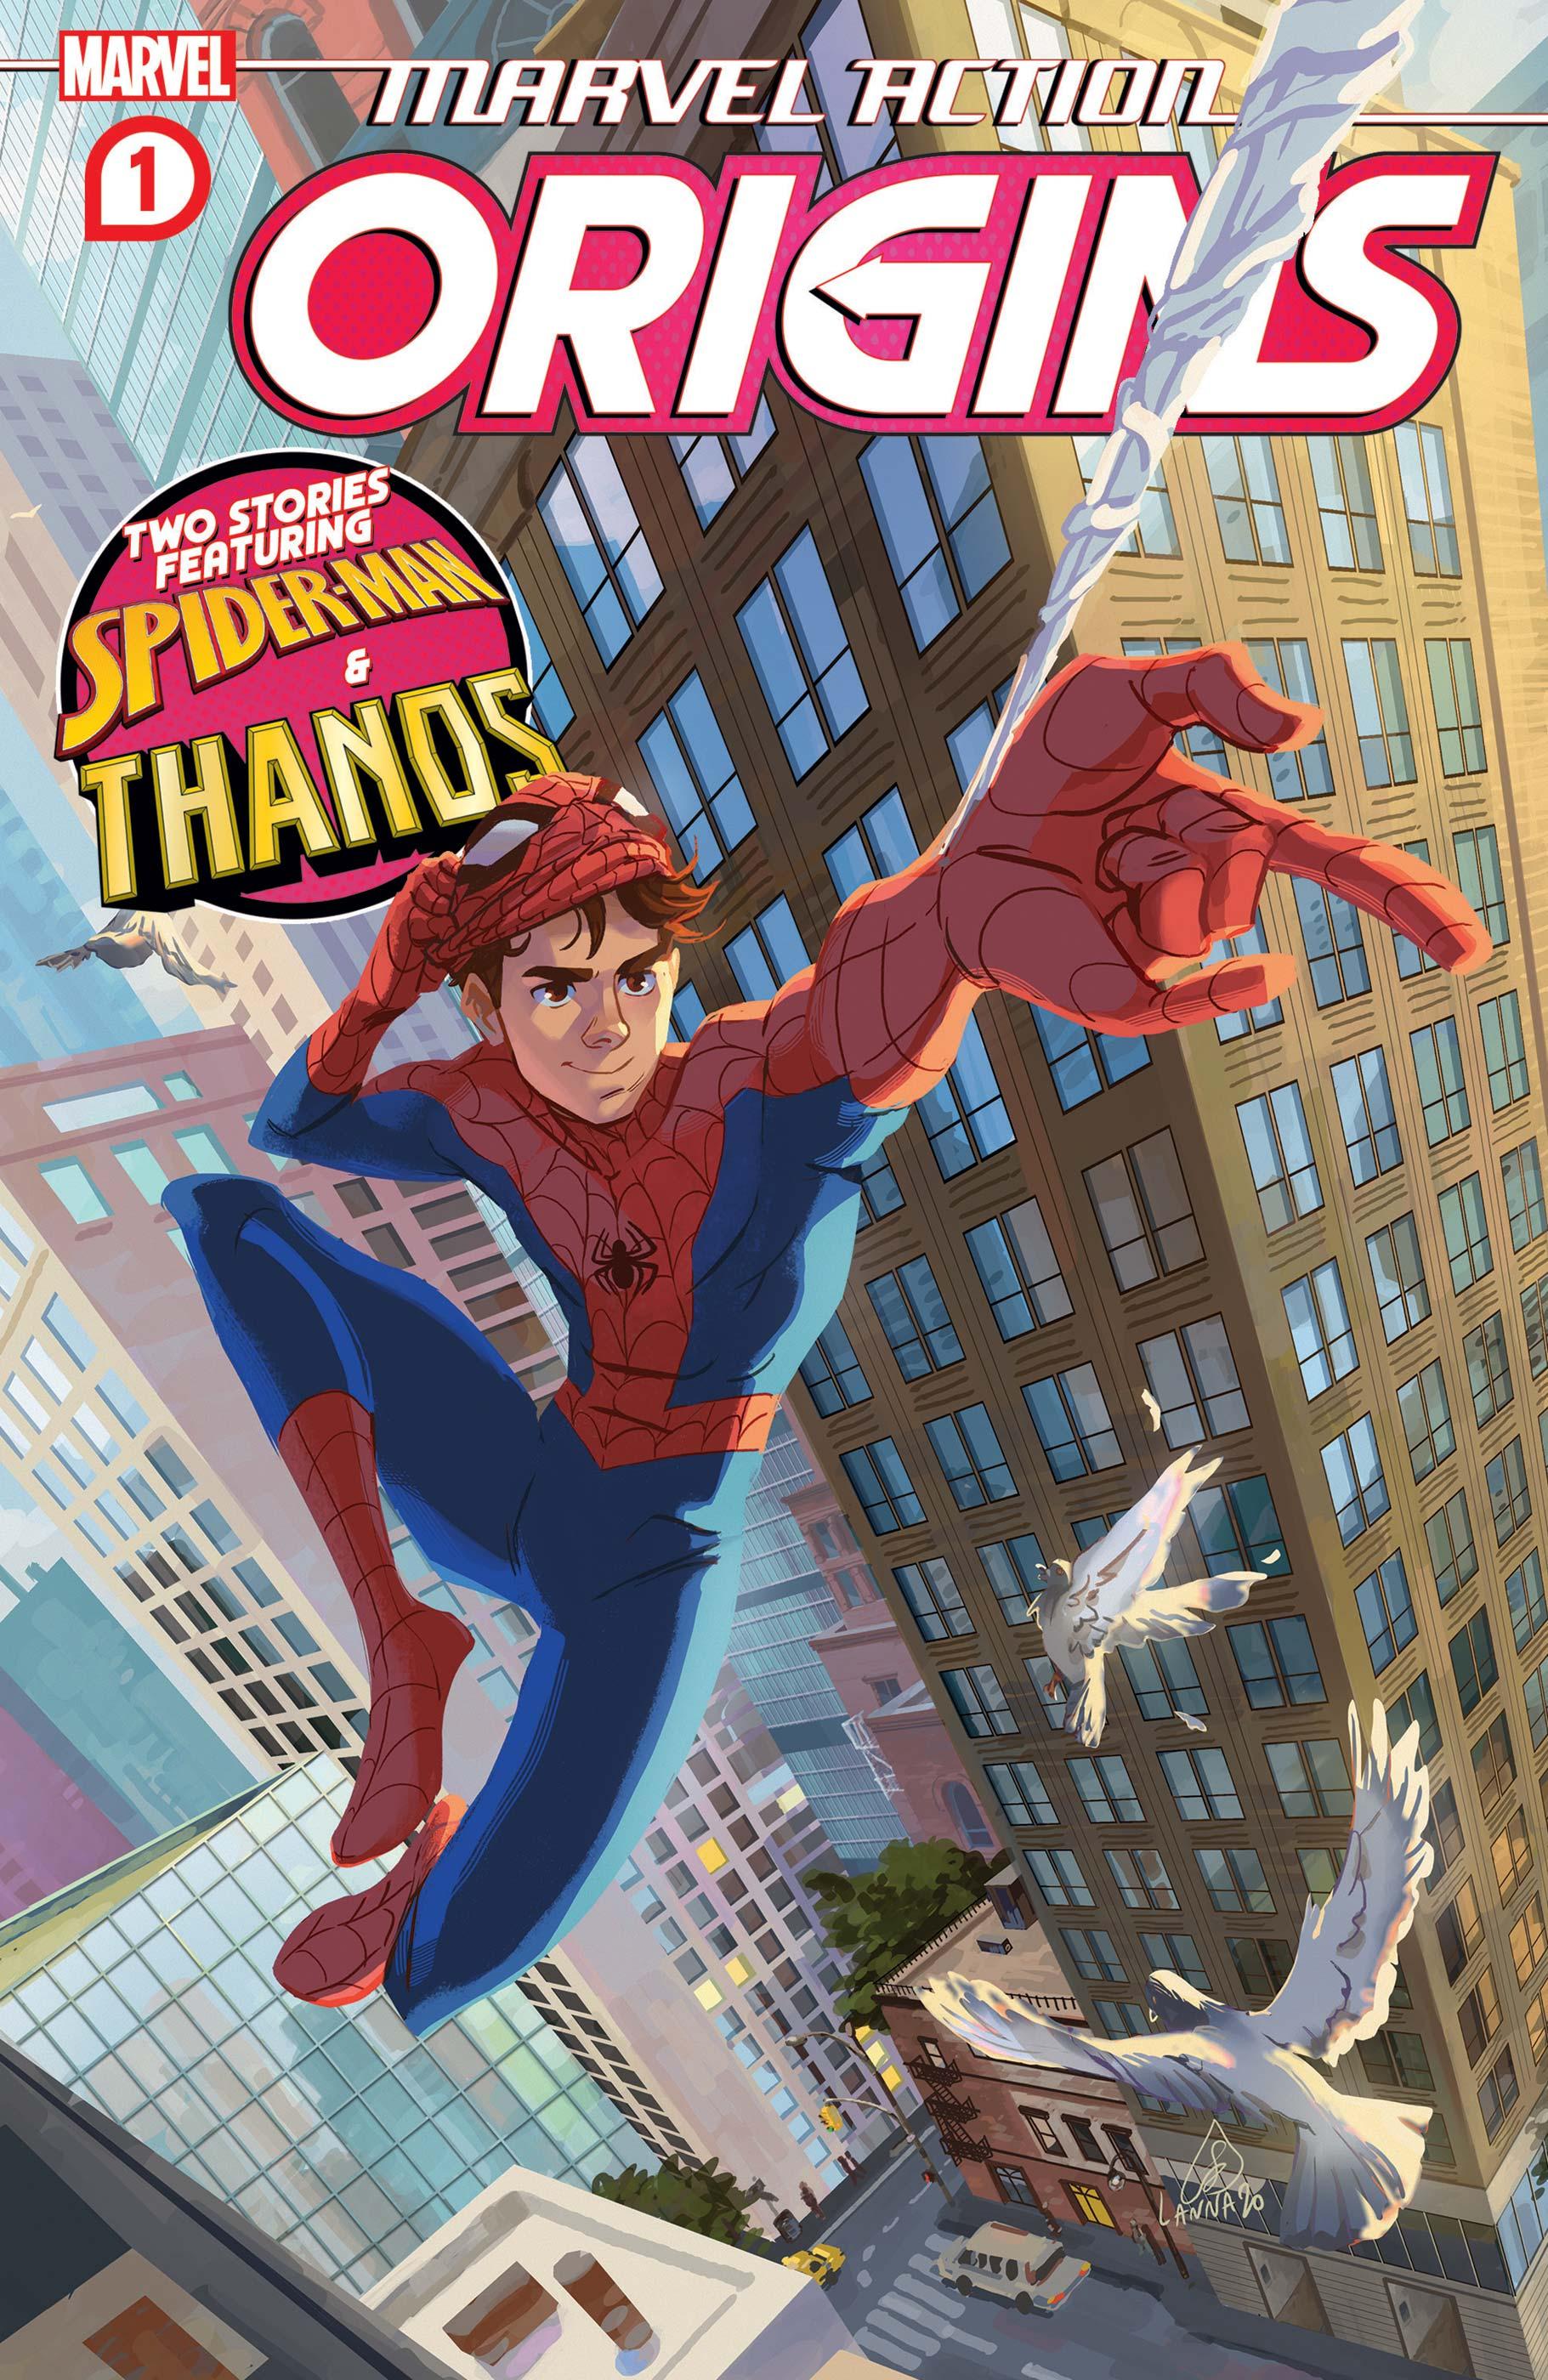 Marvel Action Origins (2021) #1